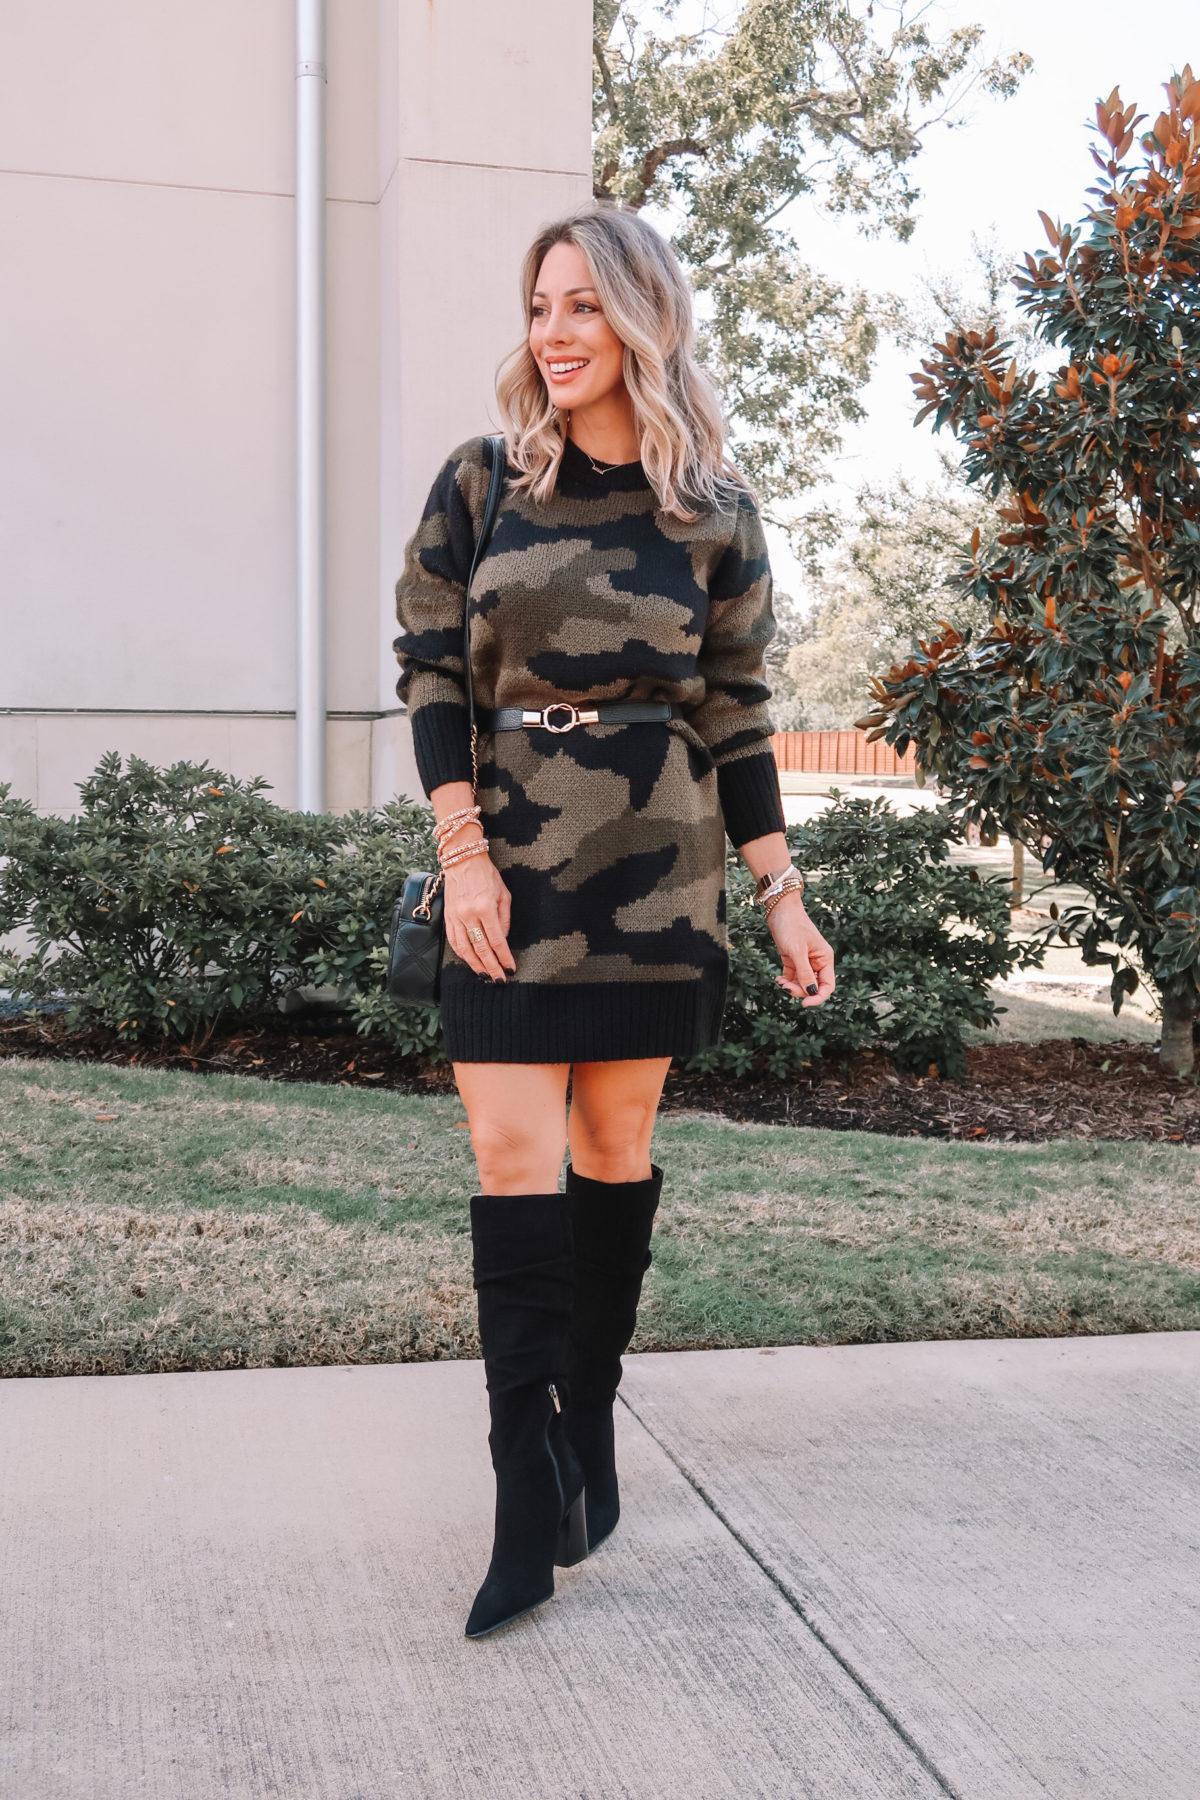 Outfits Lately, Walmart Dress, Boots, Belt